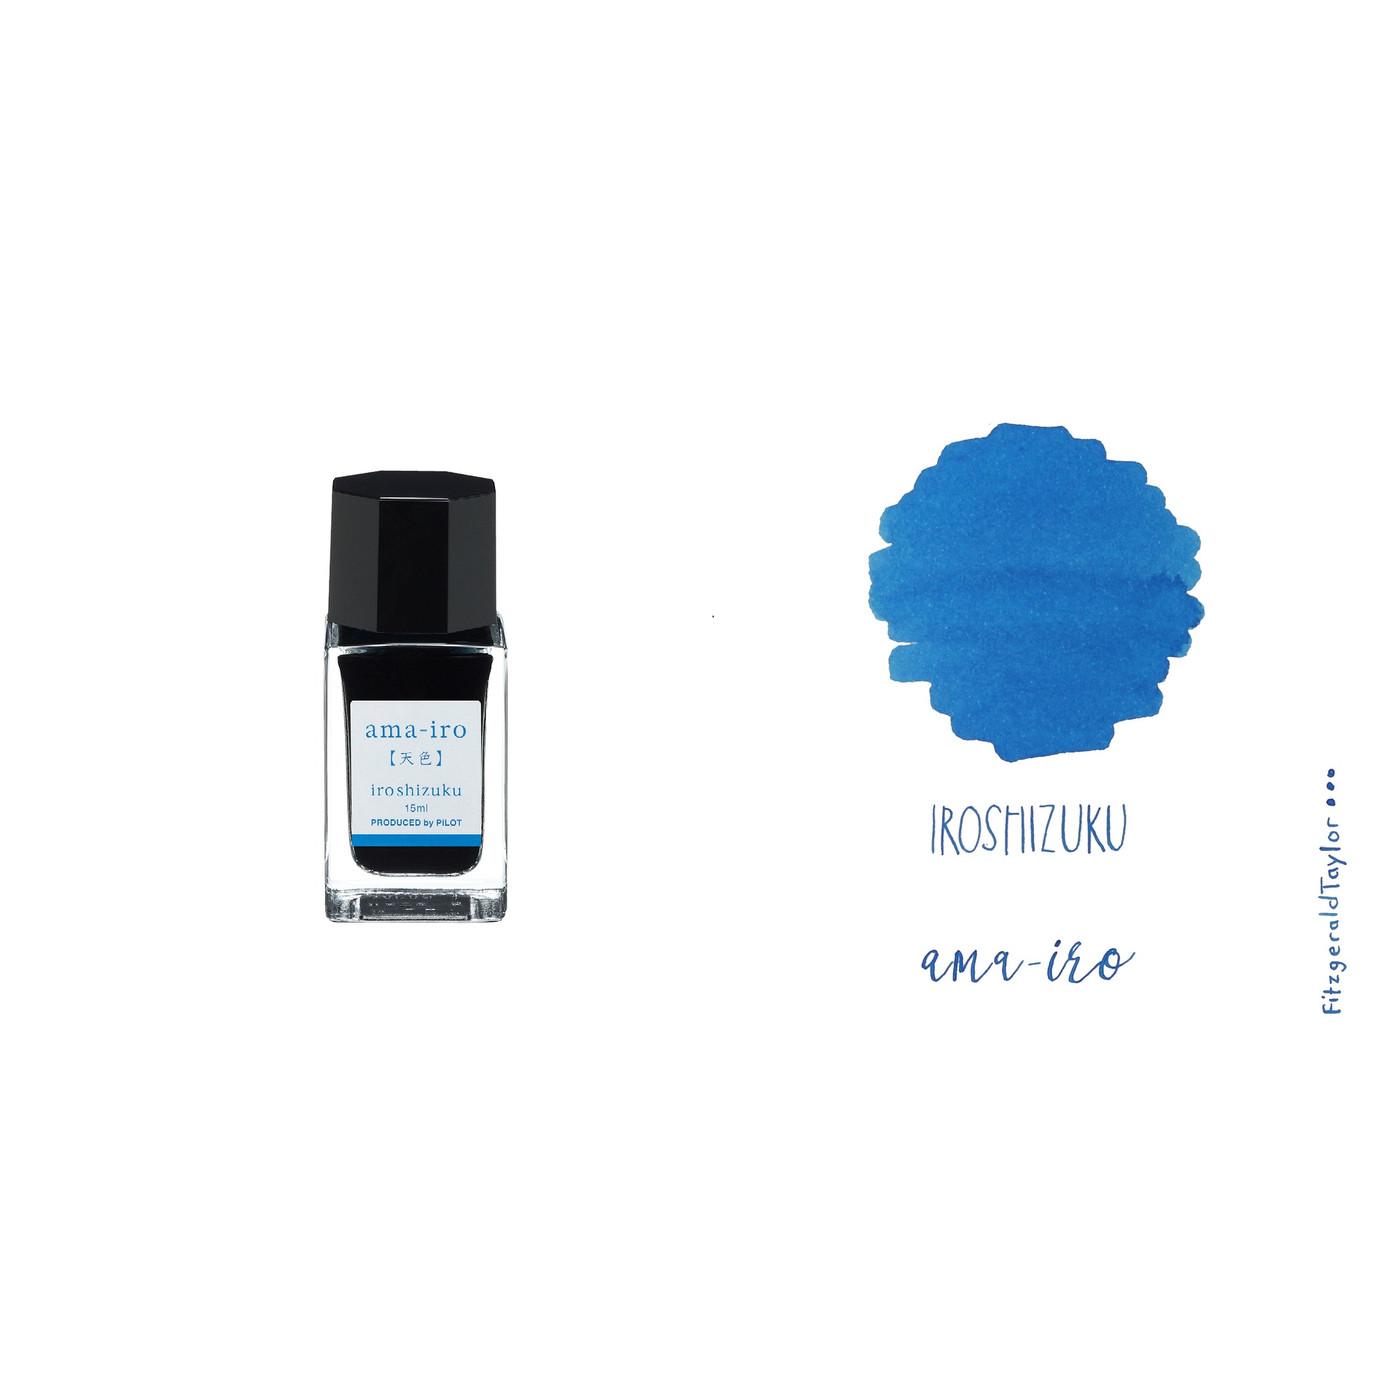 Iroshizuku fountain pen ink 15ml